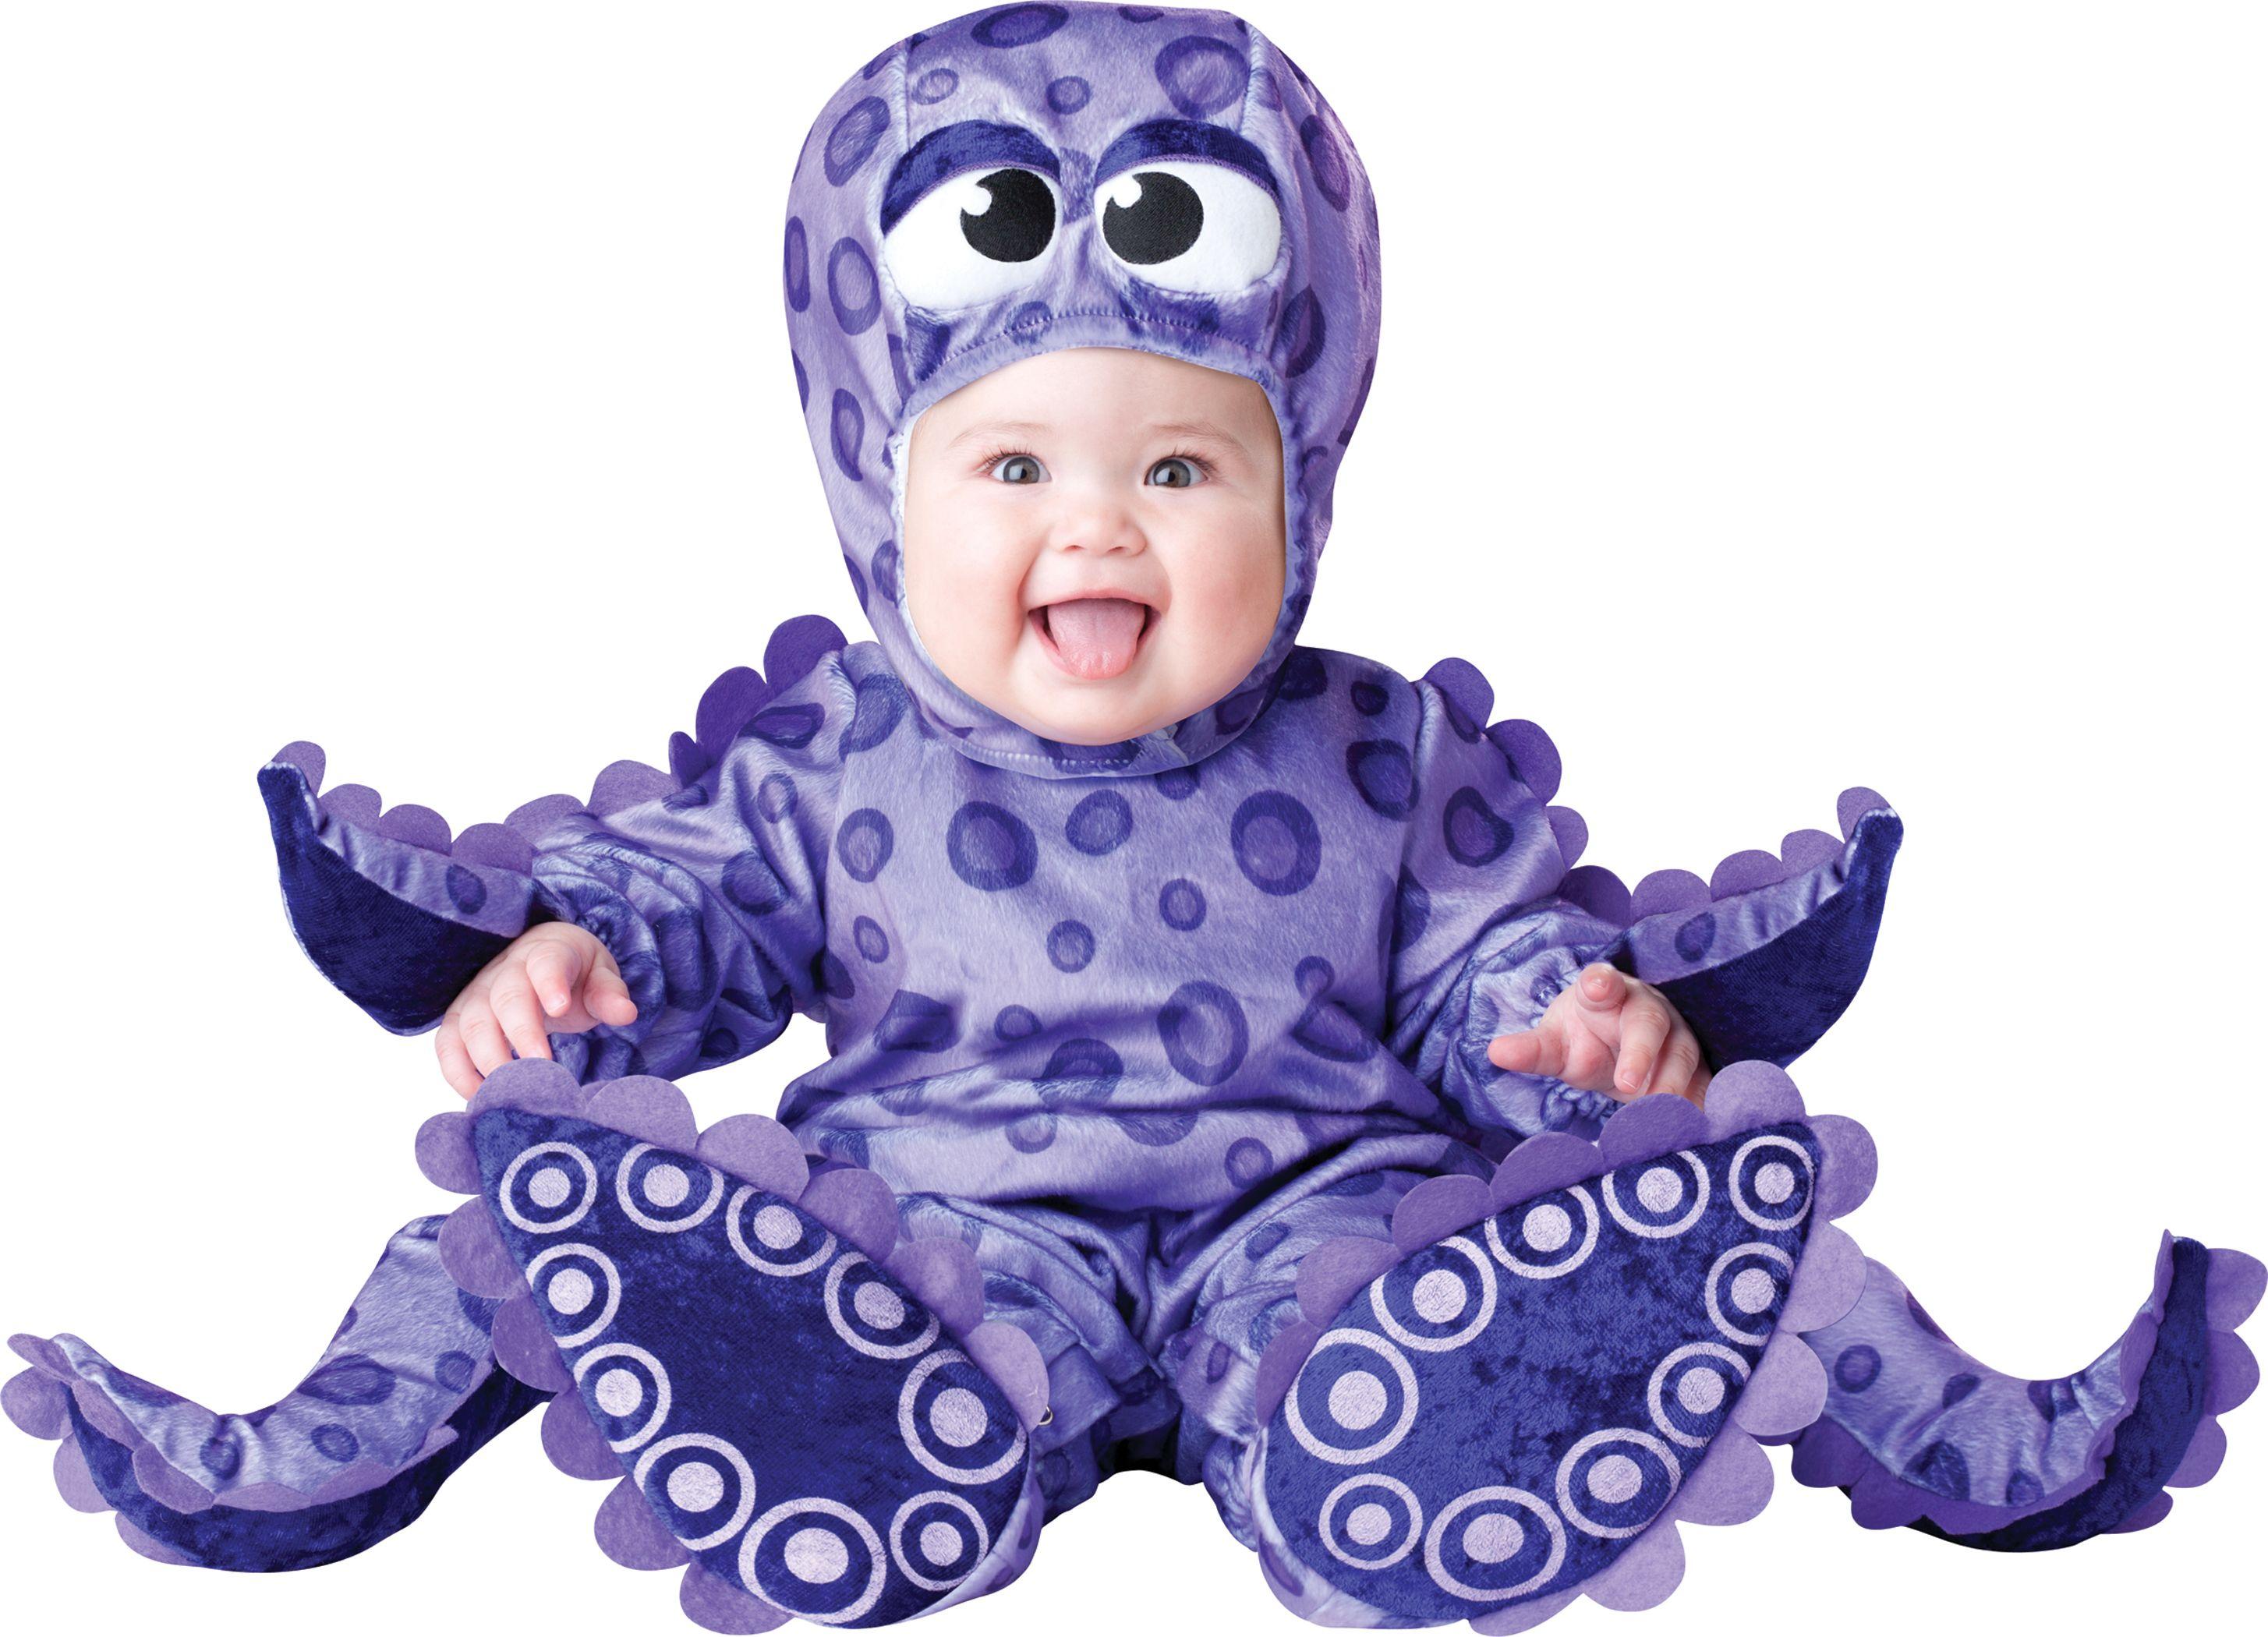 Baby Purple Octopus Infant esie Halloween Fancy Dress Costume